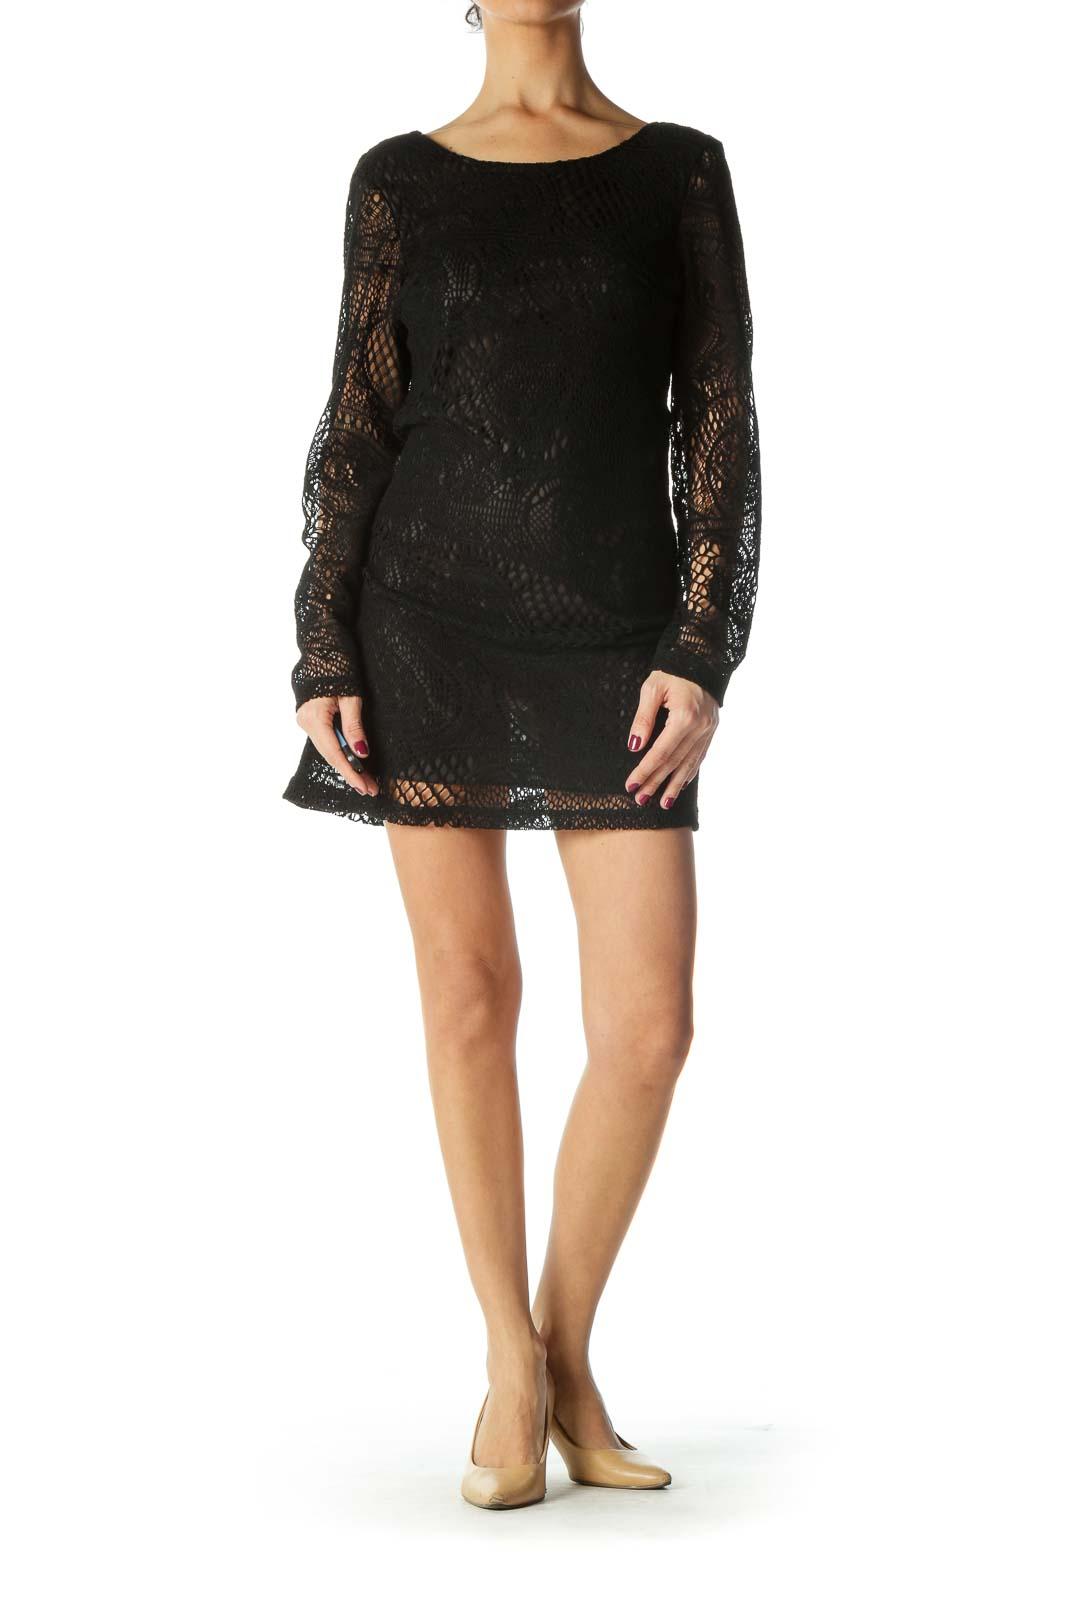 Black Knit Sheer Long Sleeve Dress